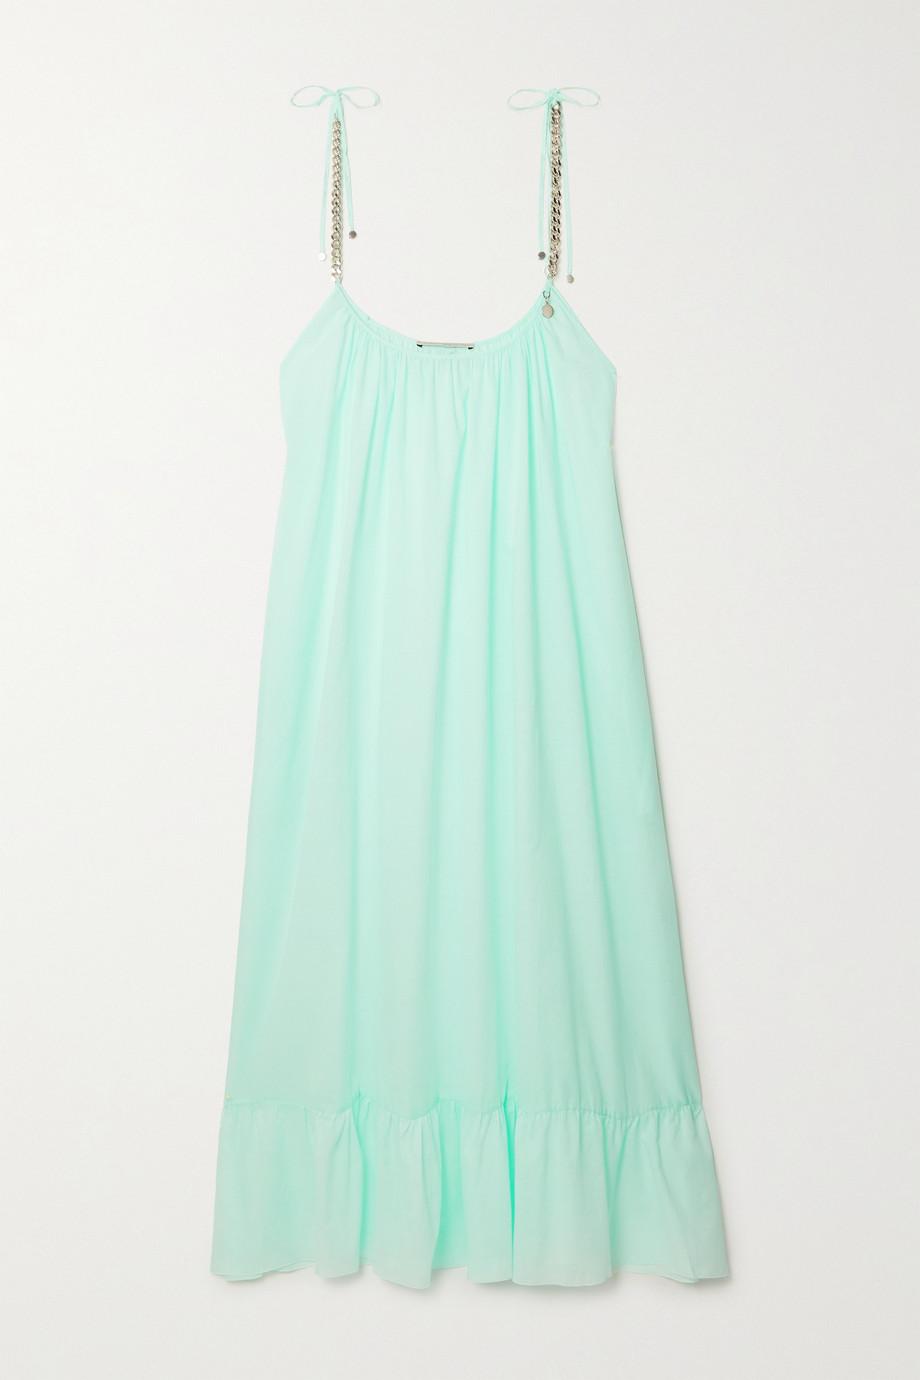 Stella McCartney + NET SUSTAIN chain-embellished organic cotton-gauze dress